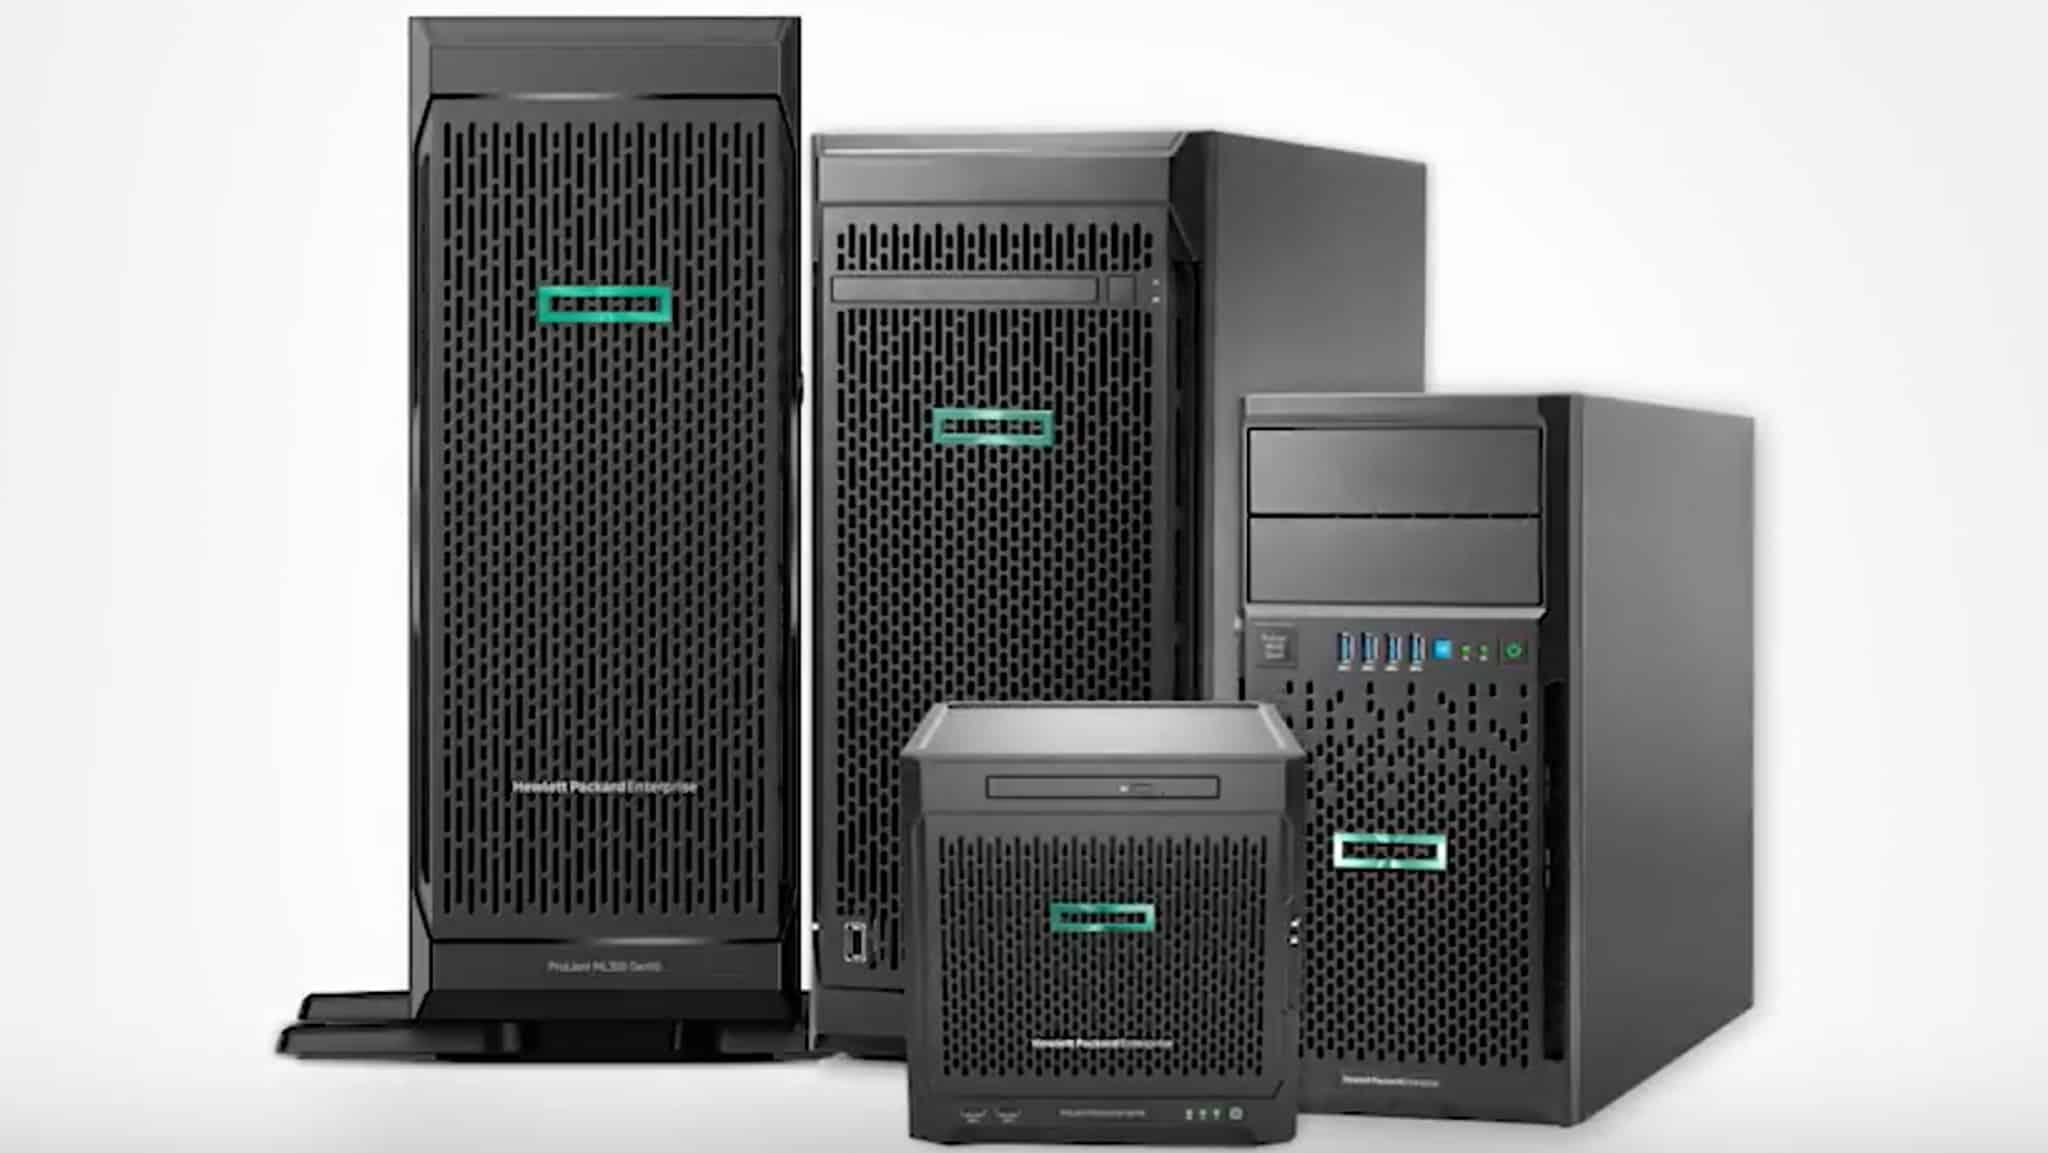 Заказ и доставка сервера